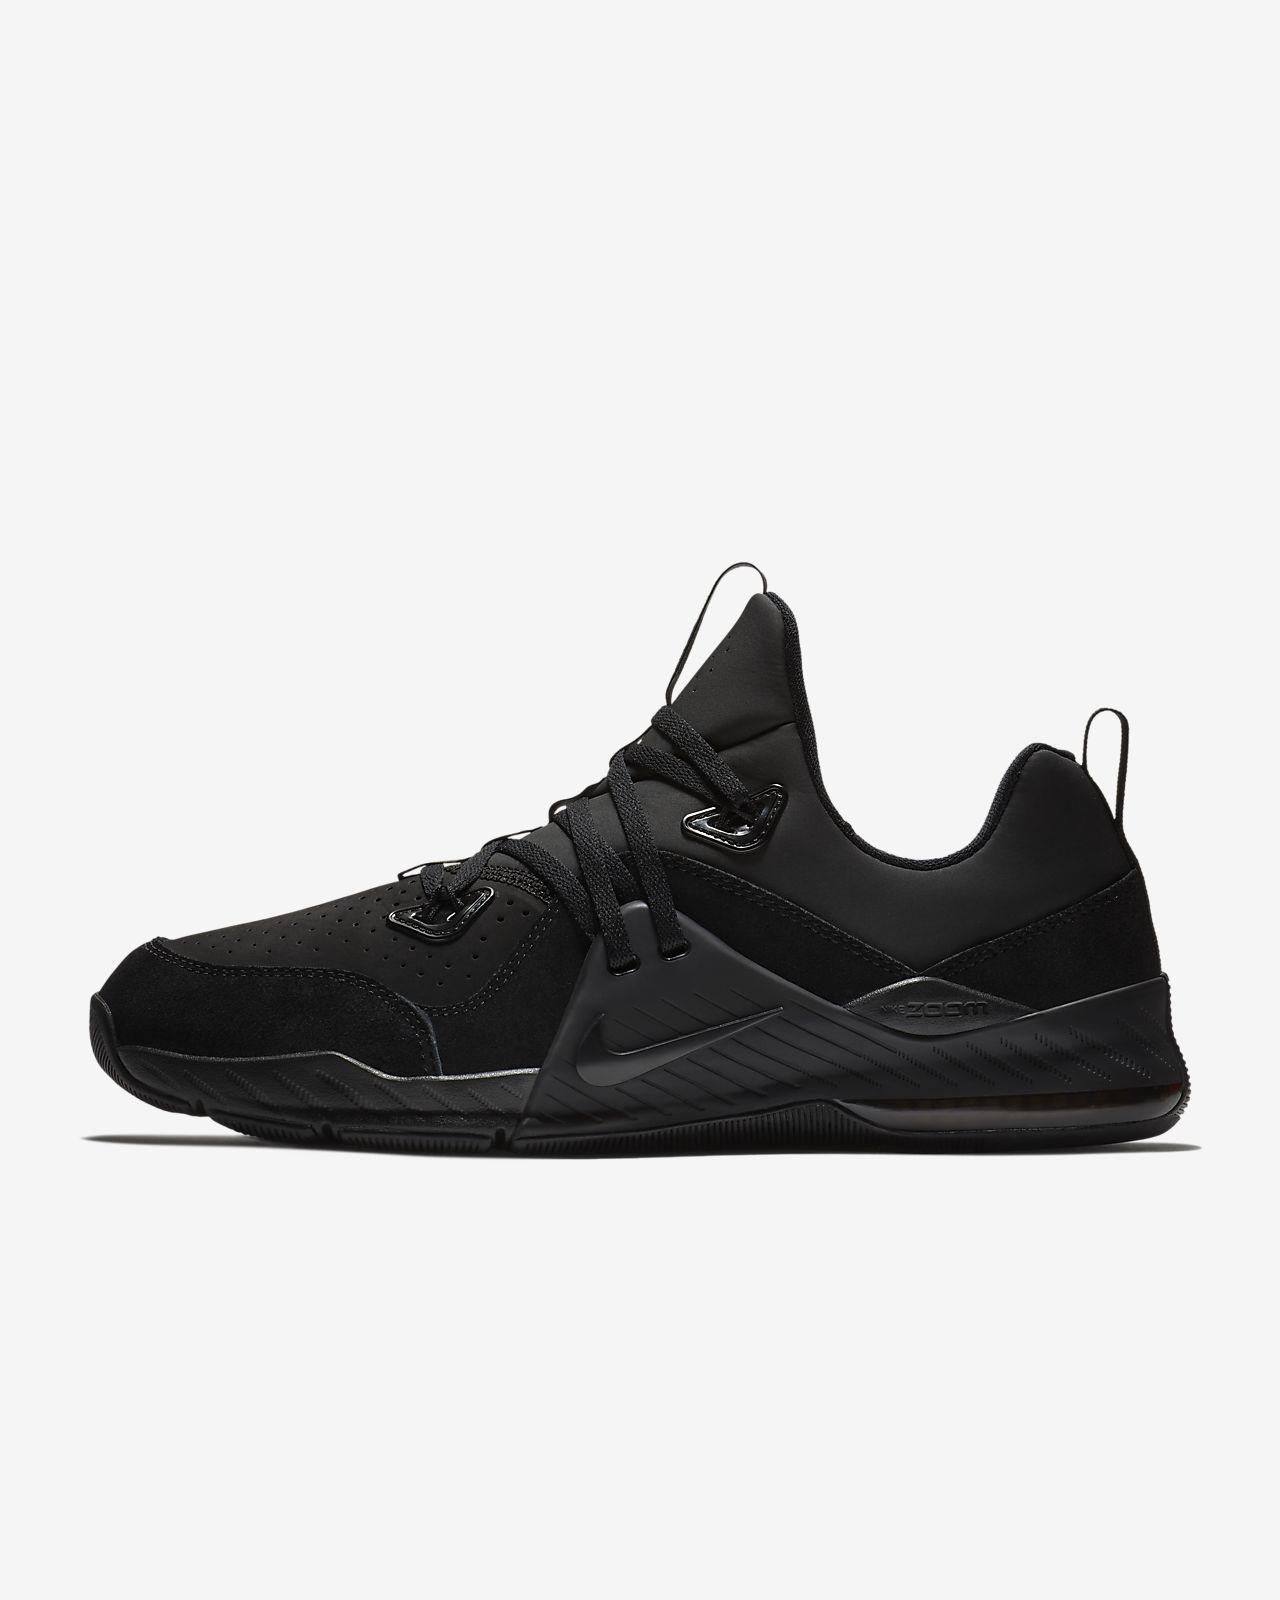 ad3ea22c10fd Nike Zoom Command Men s Training Boxing Shoe. Nike.com